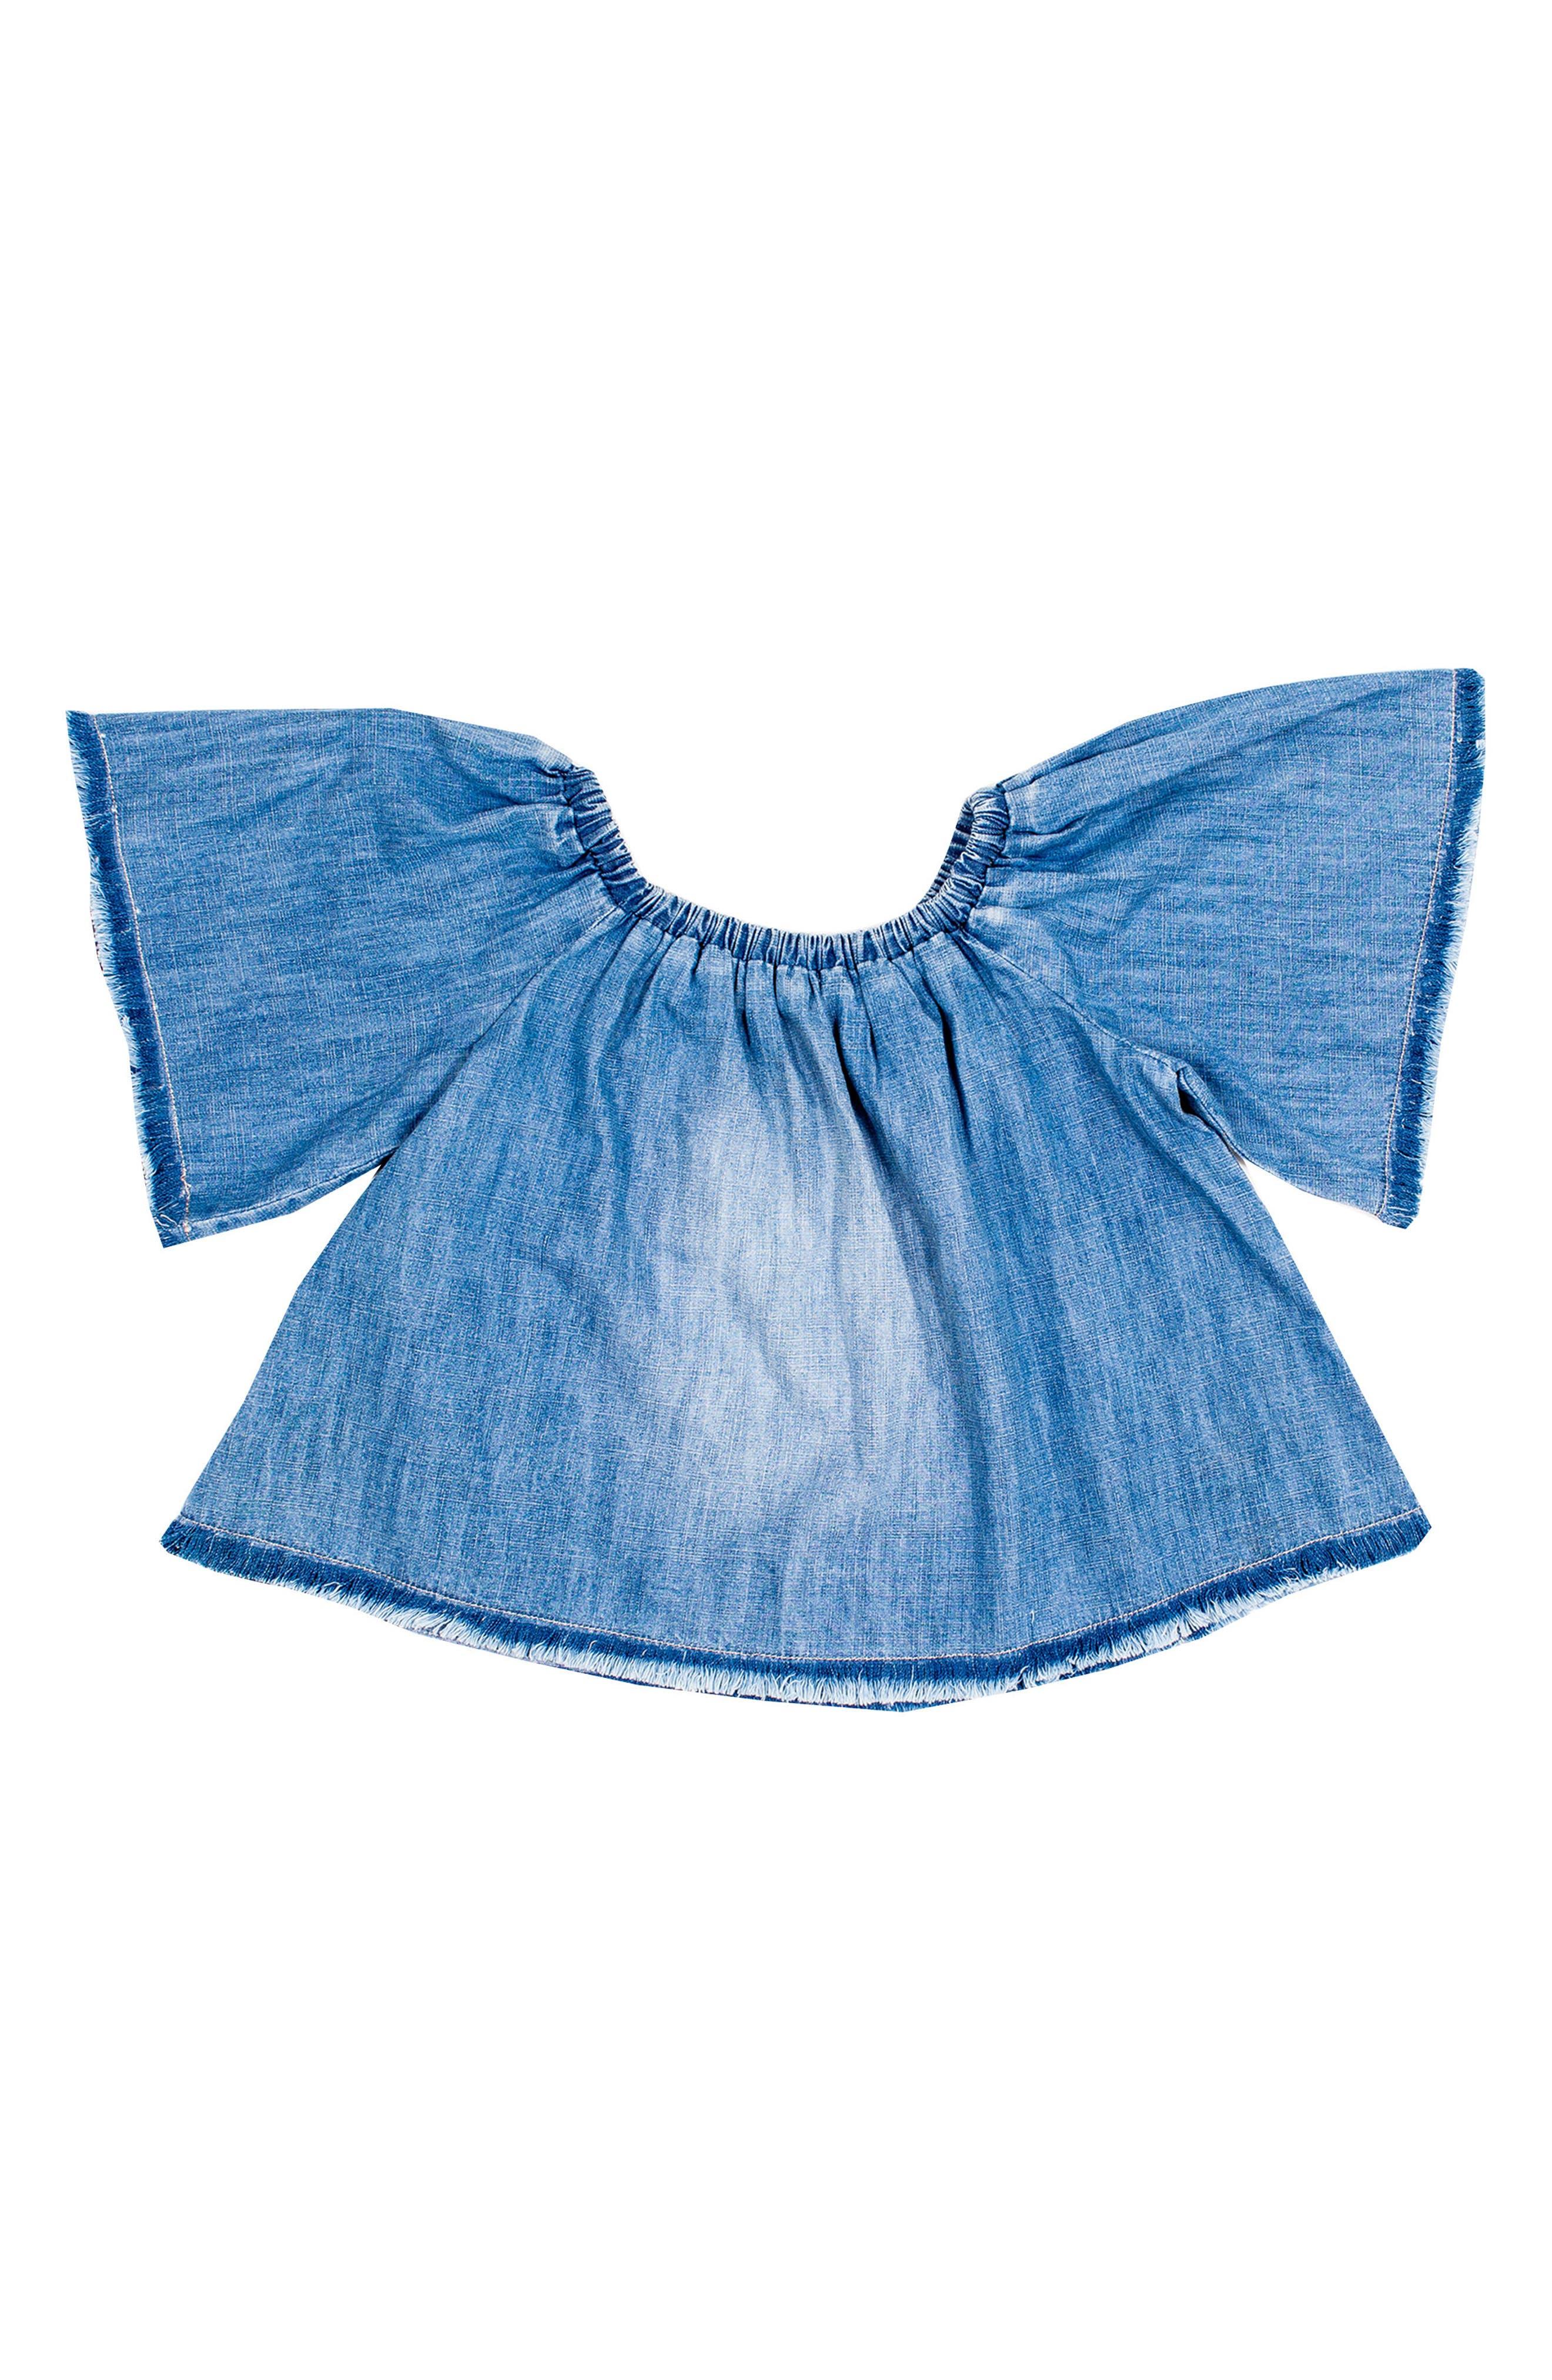 BOWIE X JAMES Fray Denim Off the Shoulder Top (Toddler Girls, Little Girls & Big Girls)